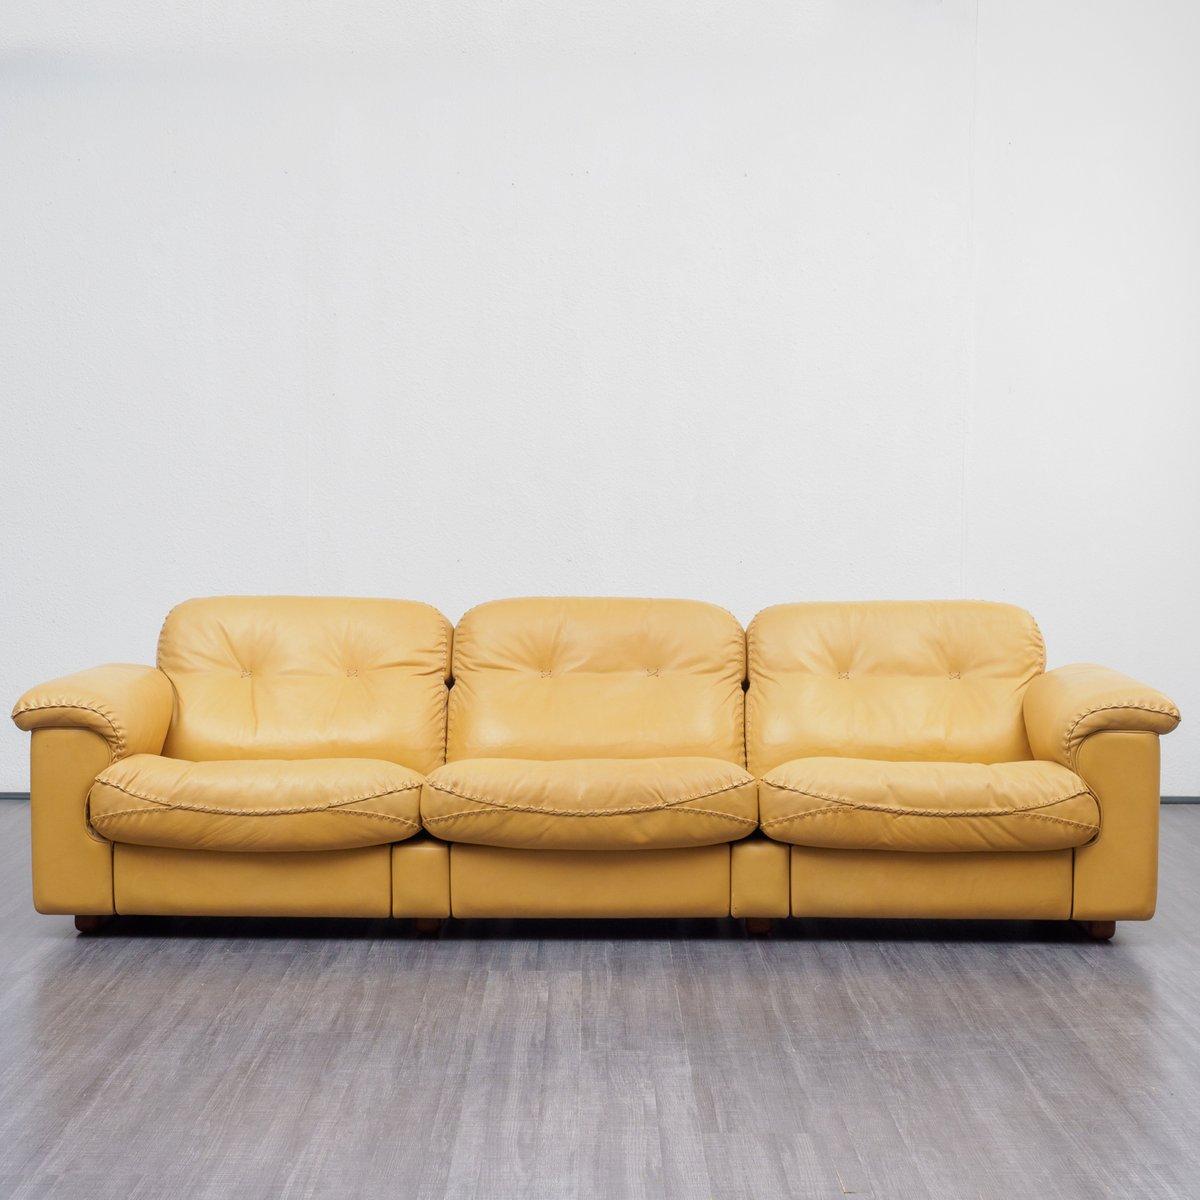 Vintage Modell DS 101 3-Sitzer Sofa von de Sede